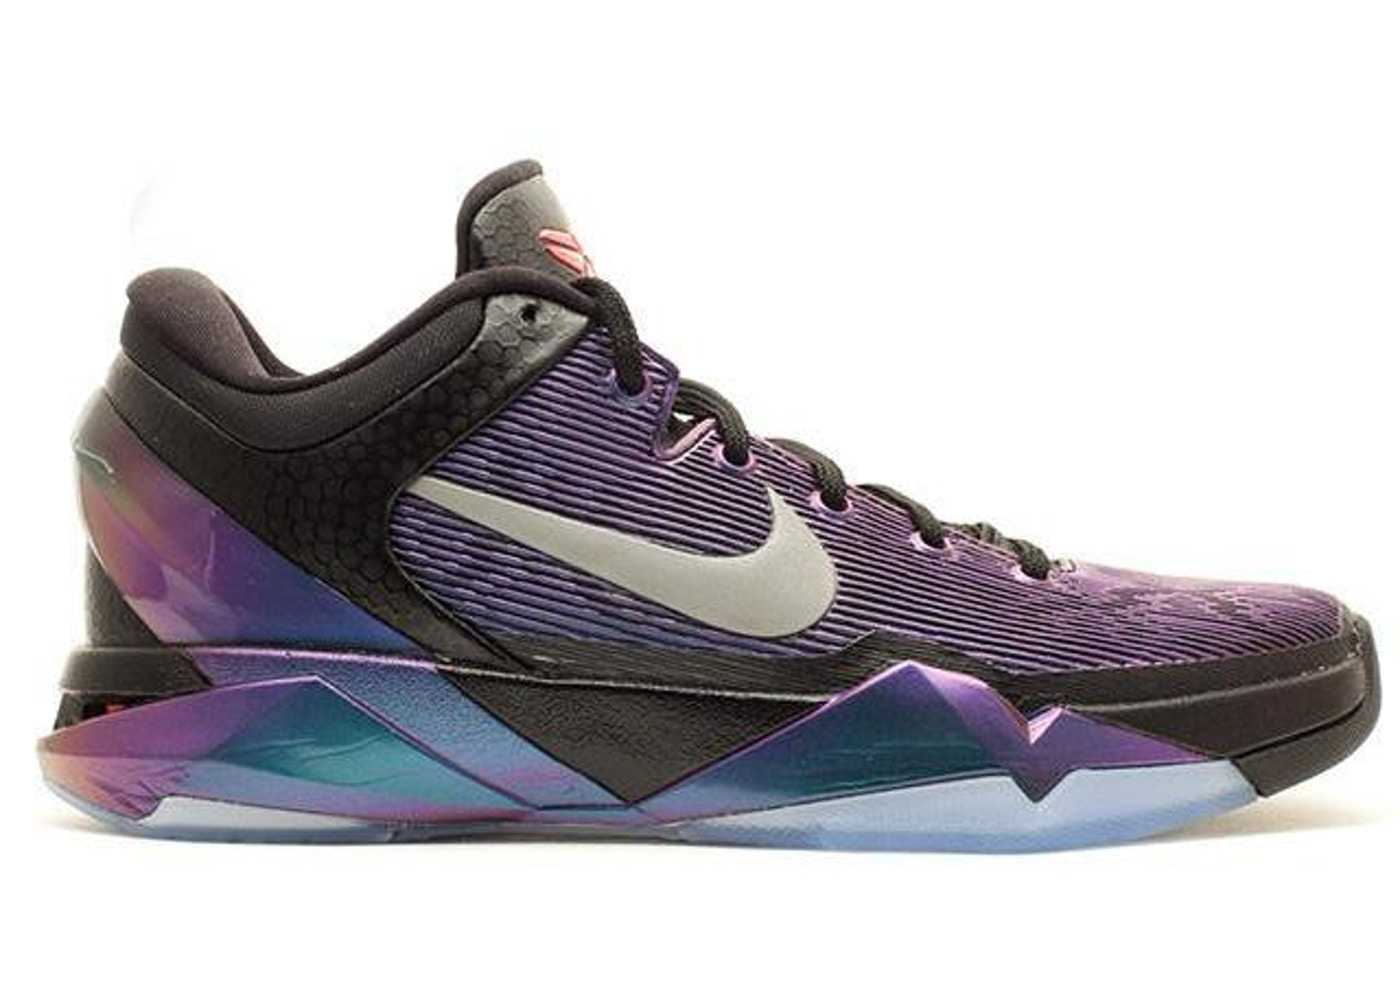 buy online a48ff 8a056 Nike Kobe 7 Shoes - Average Sale Price